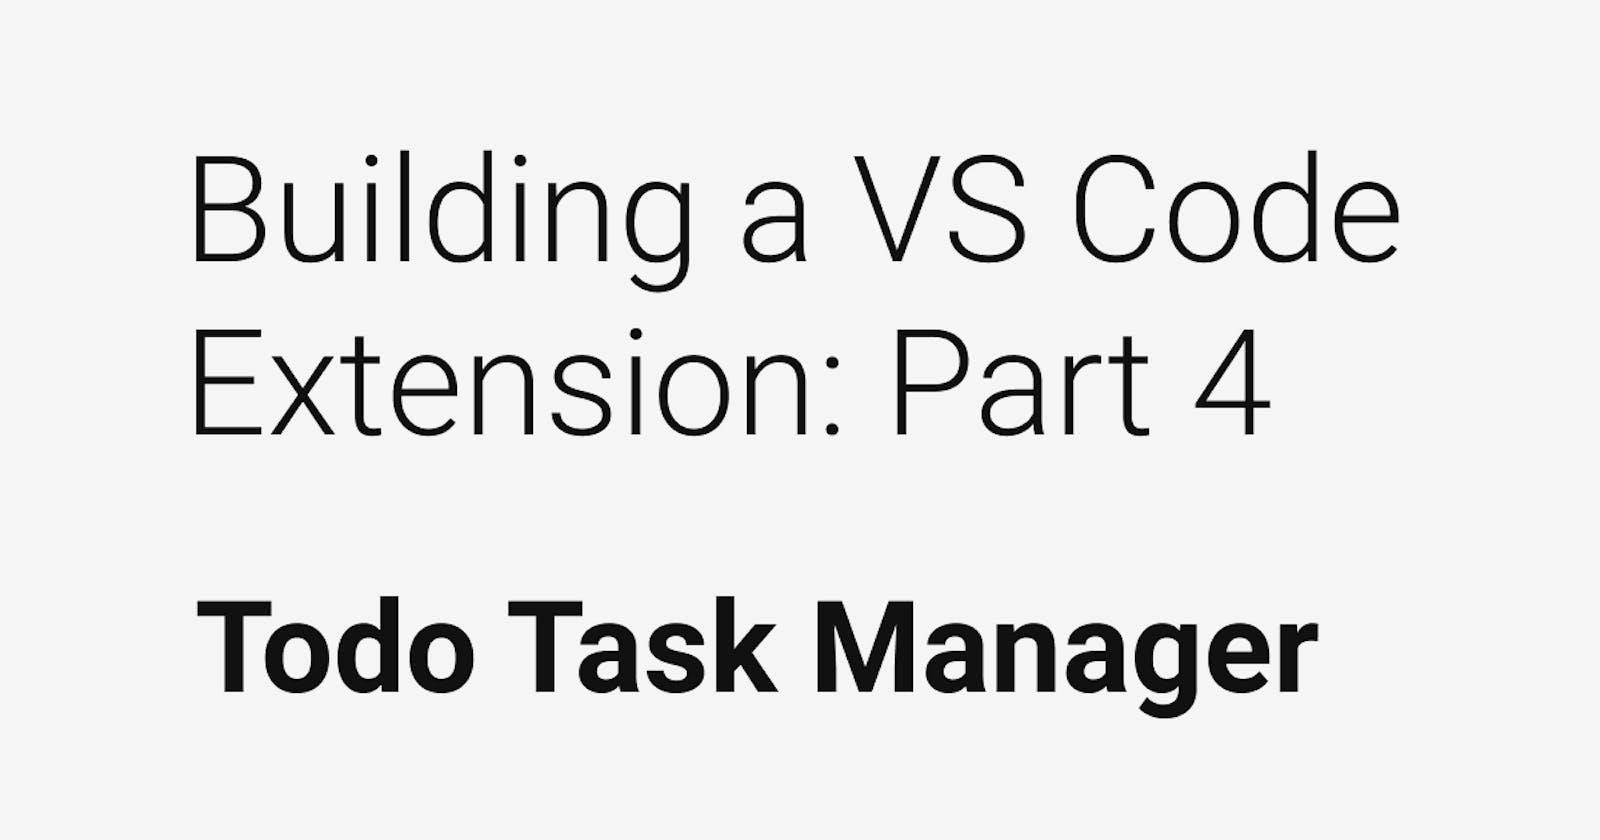 Building a VSCode Extension: Part Four